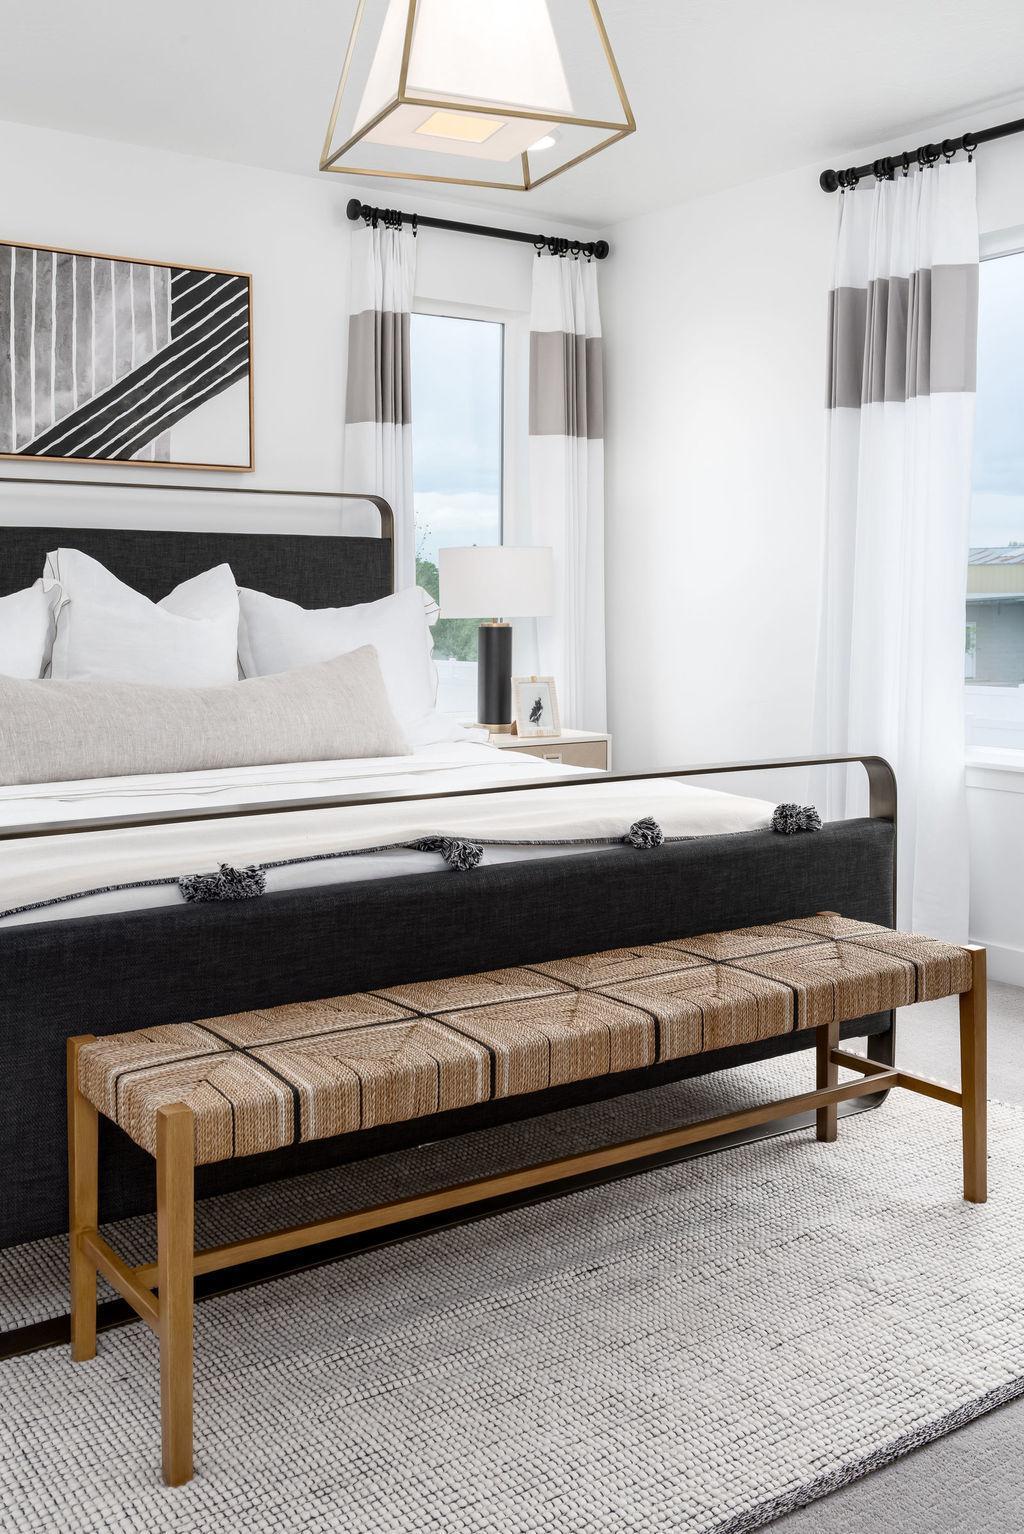 Bedroom featured in the Matisse By Garbett Homes in Salt Lake City-Ogden, UT